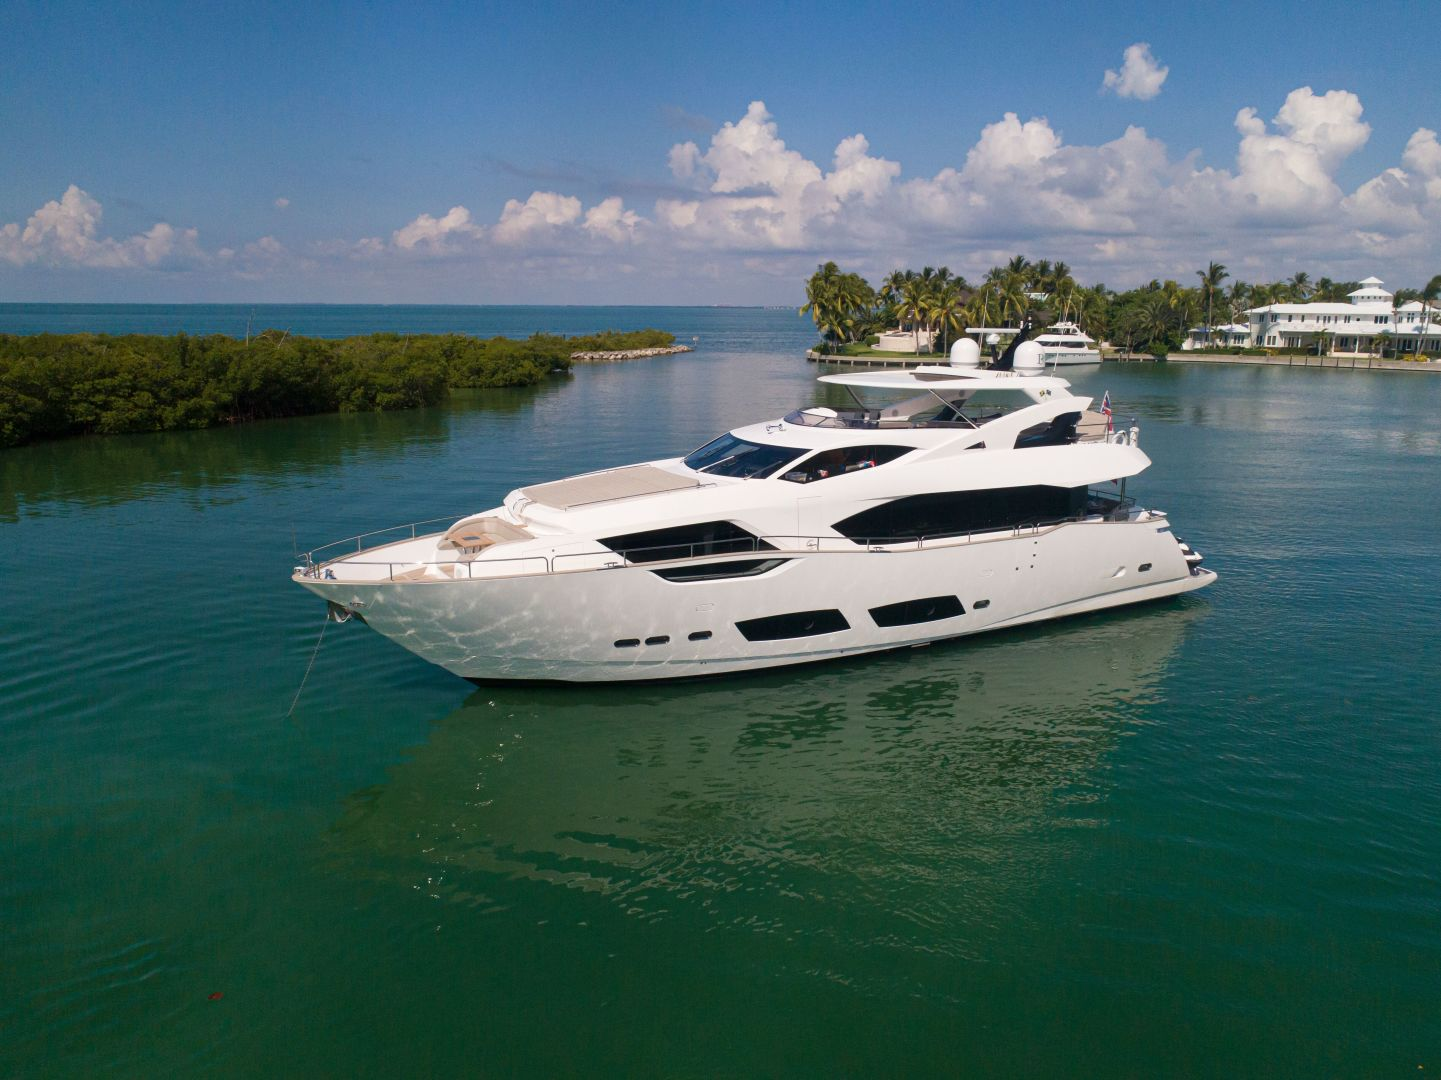 Sunseeker-95 Yacht 2017-Perseverance 3 Ft Lauderdale-Florida-United States-1400063   Thumbnail